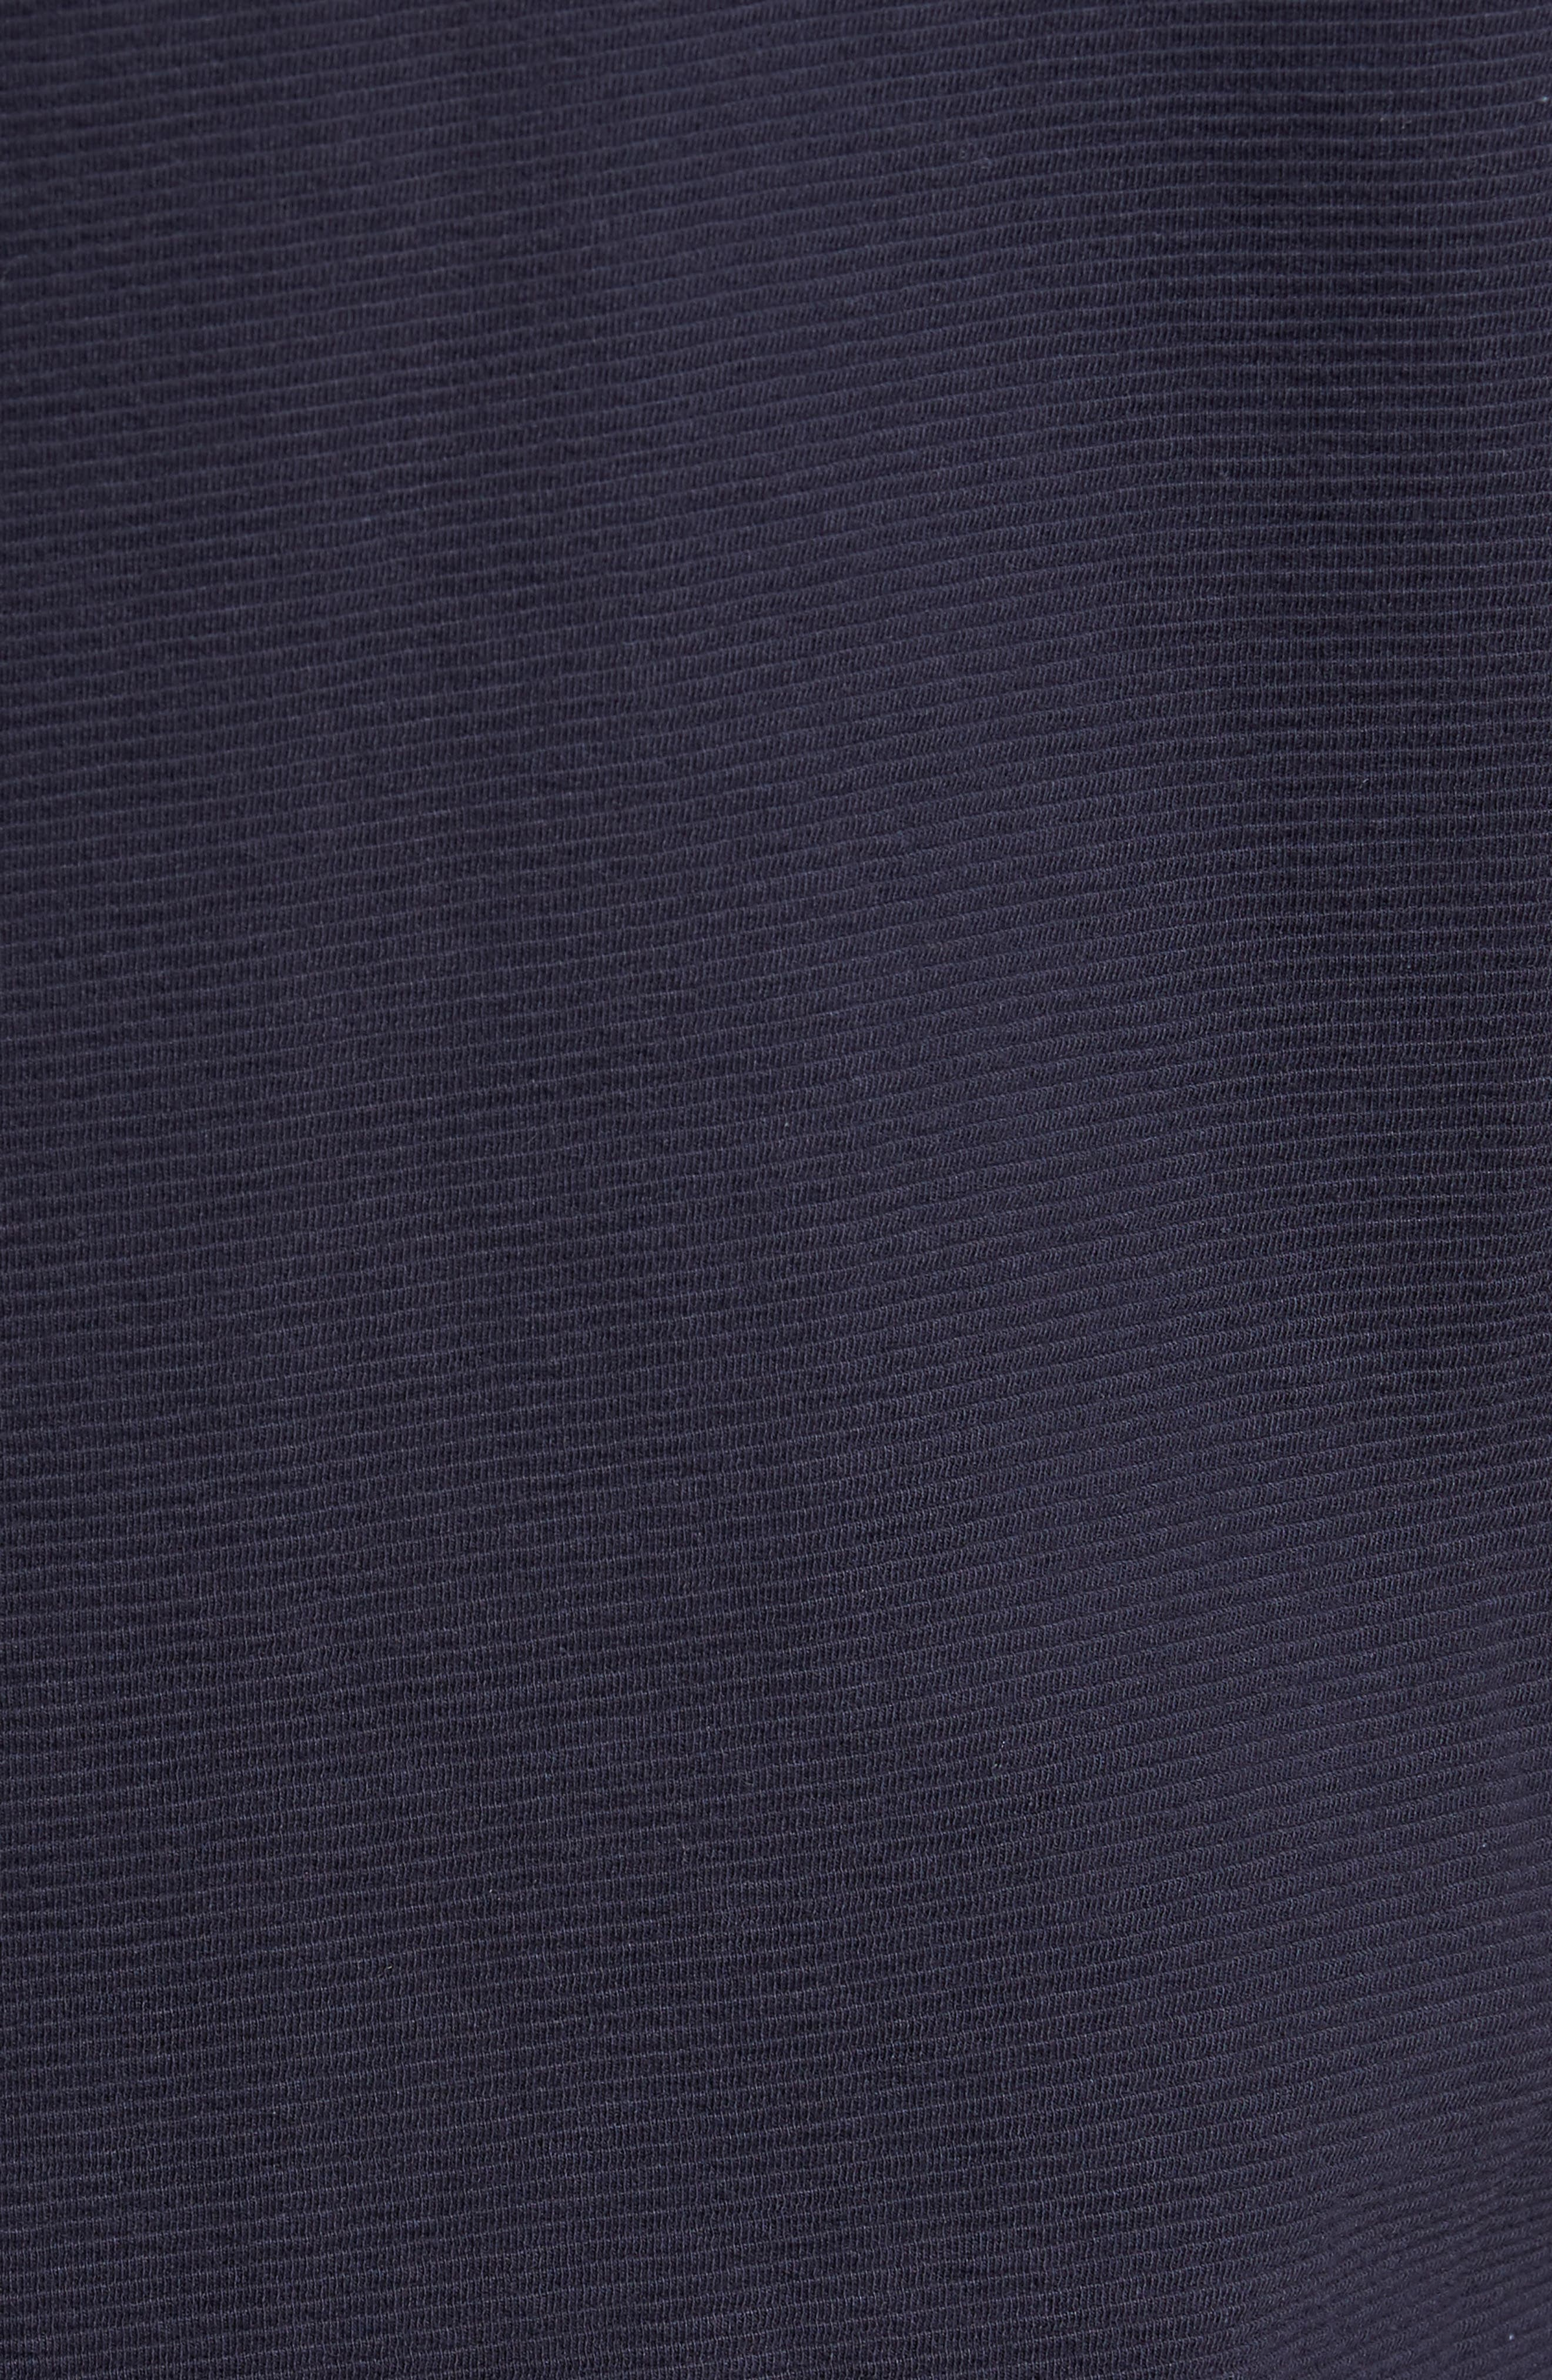 Jirgi Zip Front Jacket,                             Alternate thumbnail 5, color,                             Dark Naval Blue